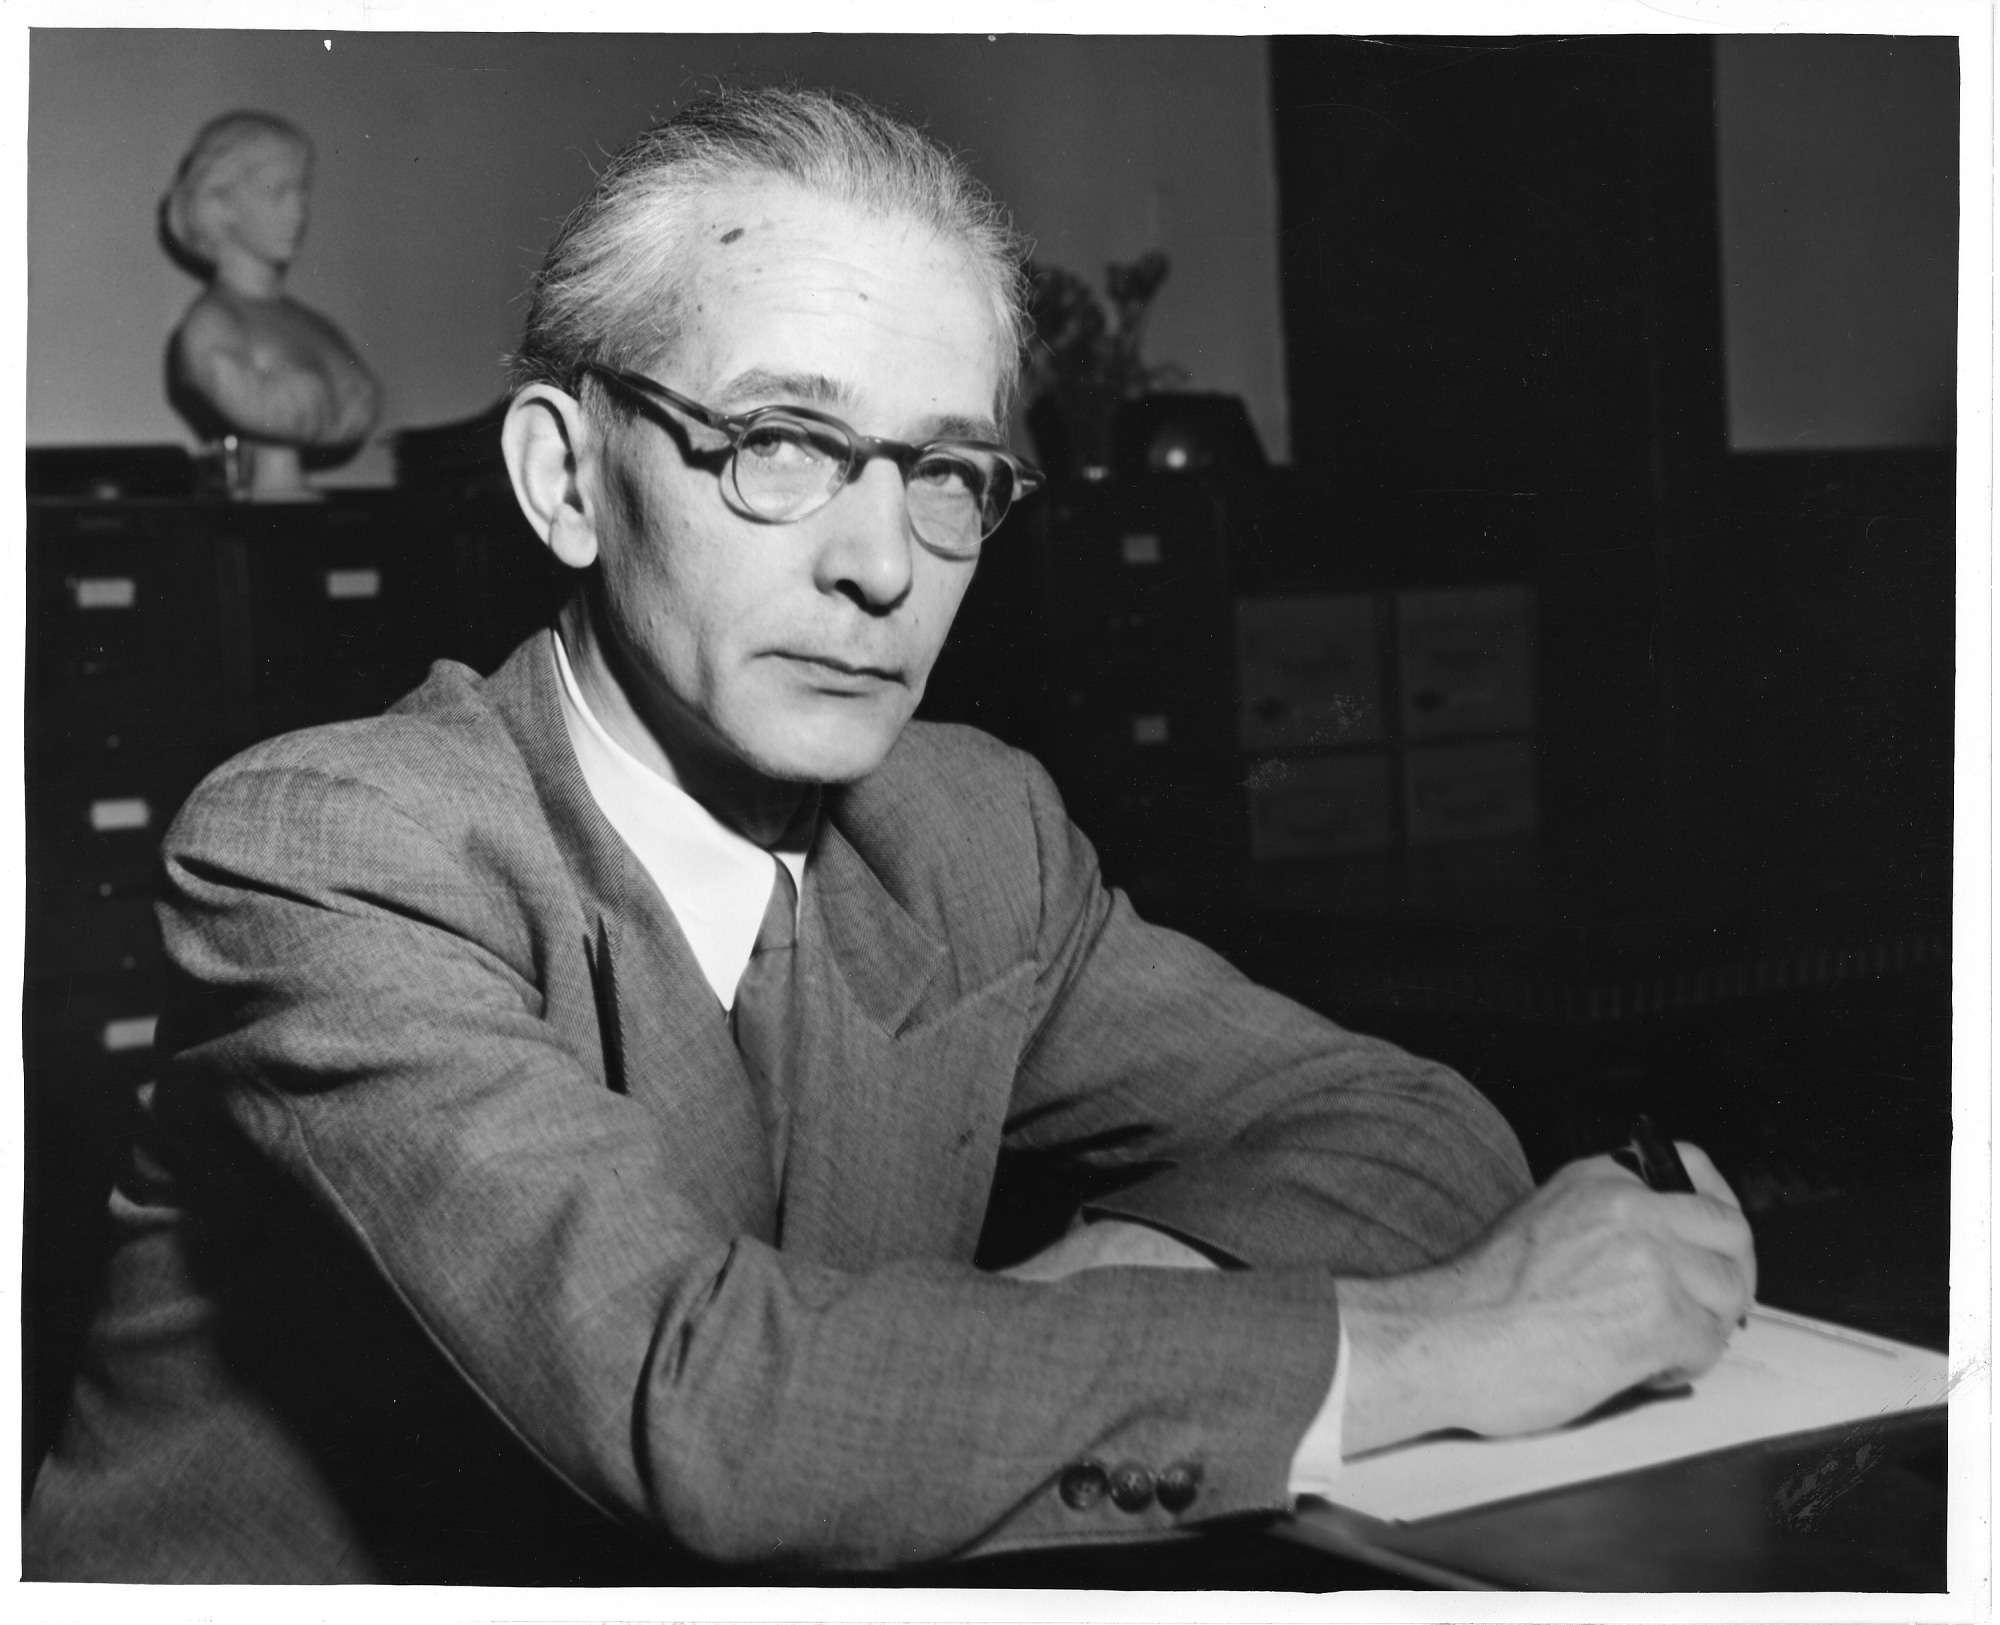 Alexander Gode (1906-1970)